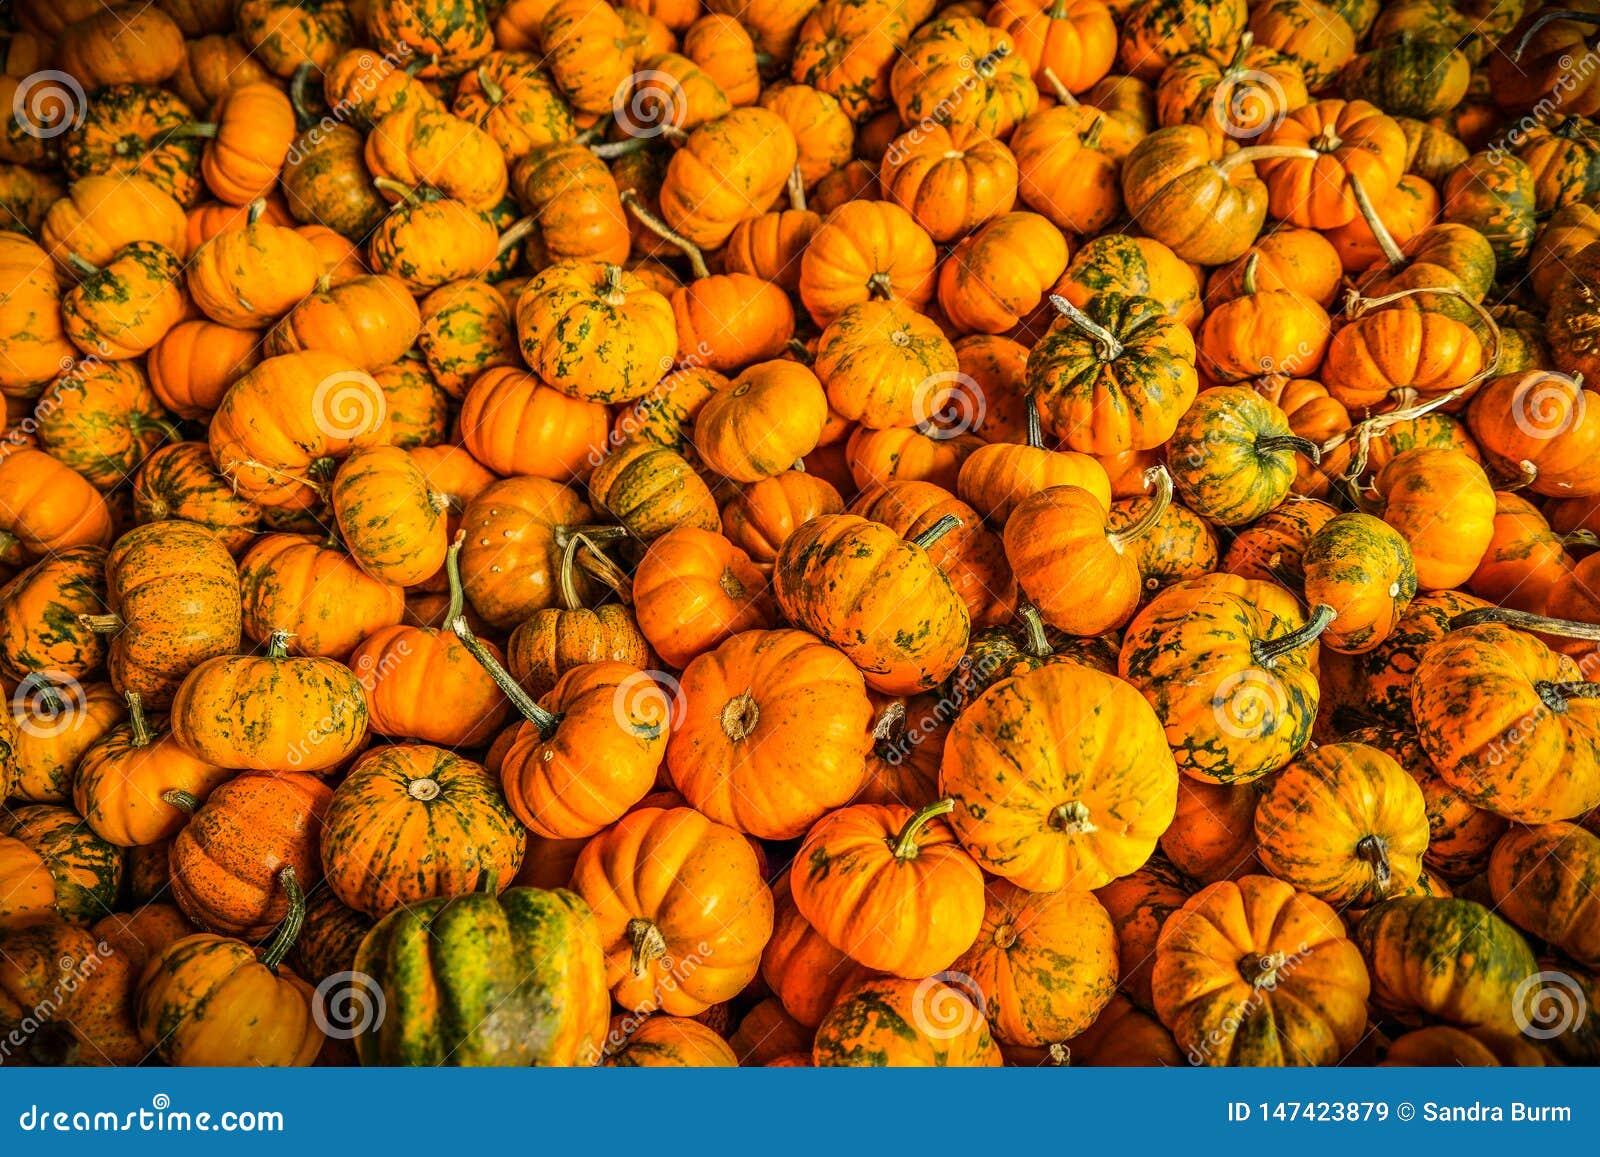 Mini potirons en automne